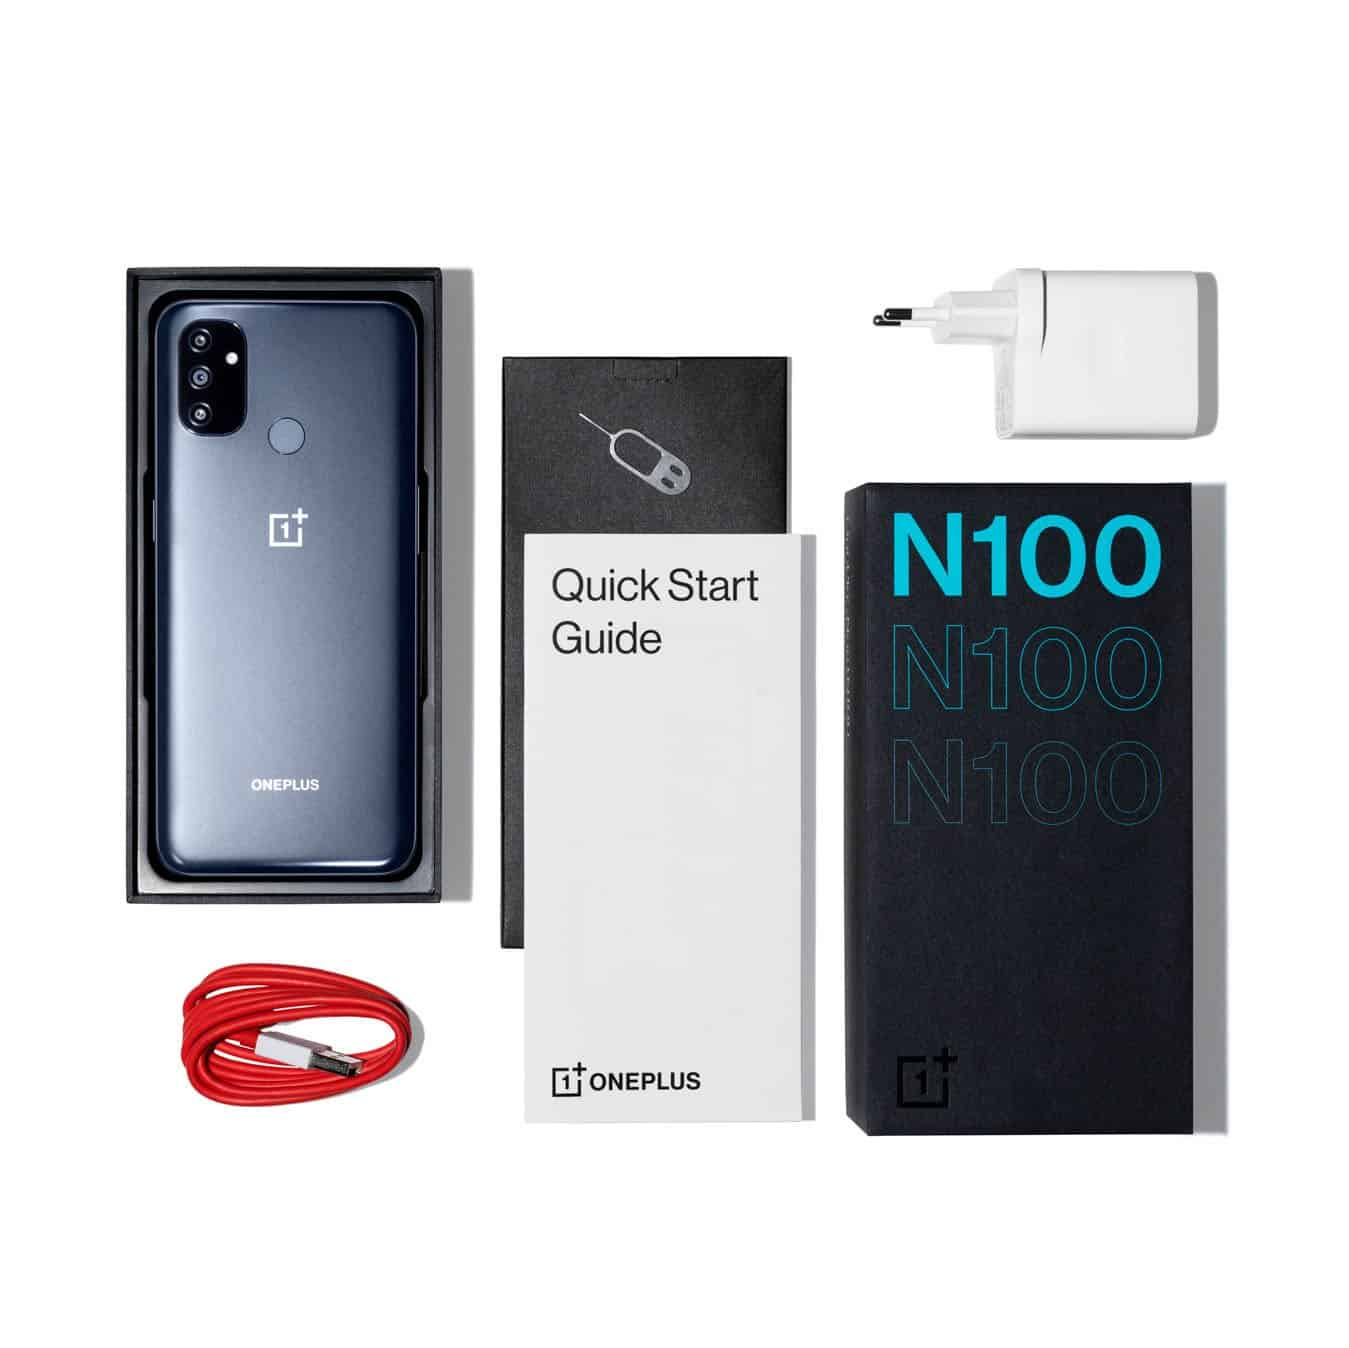 OnePlus Nord N100 image 1